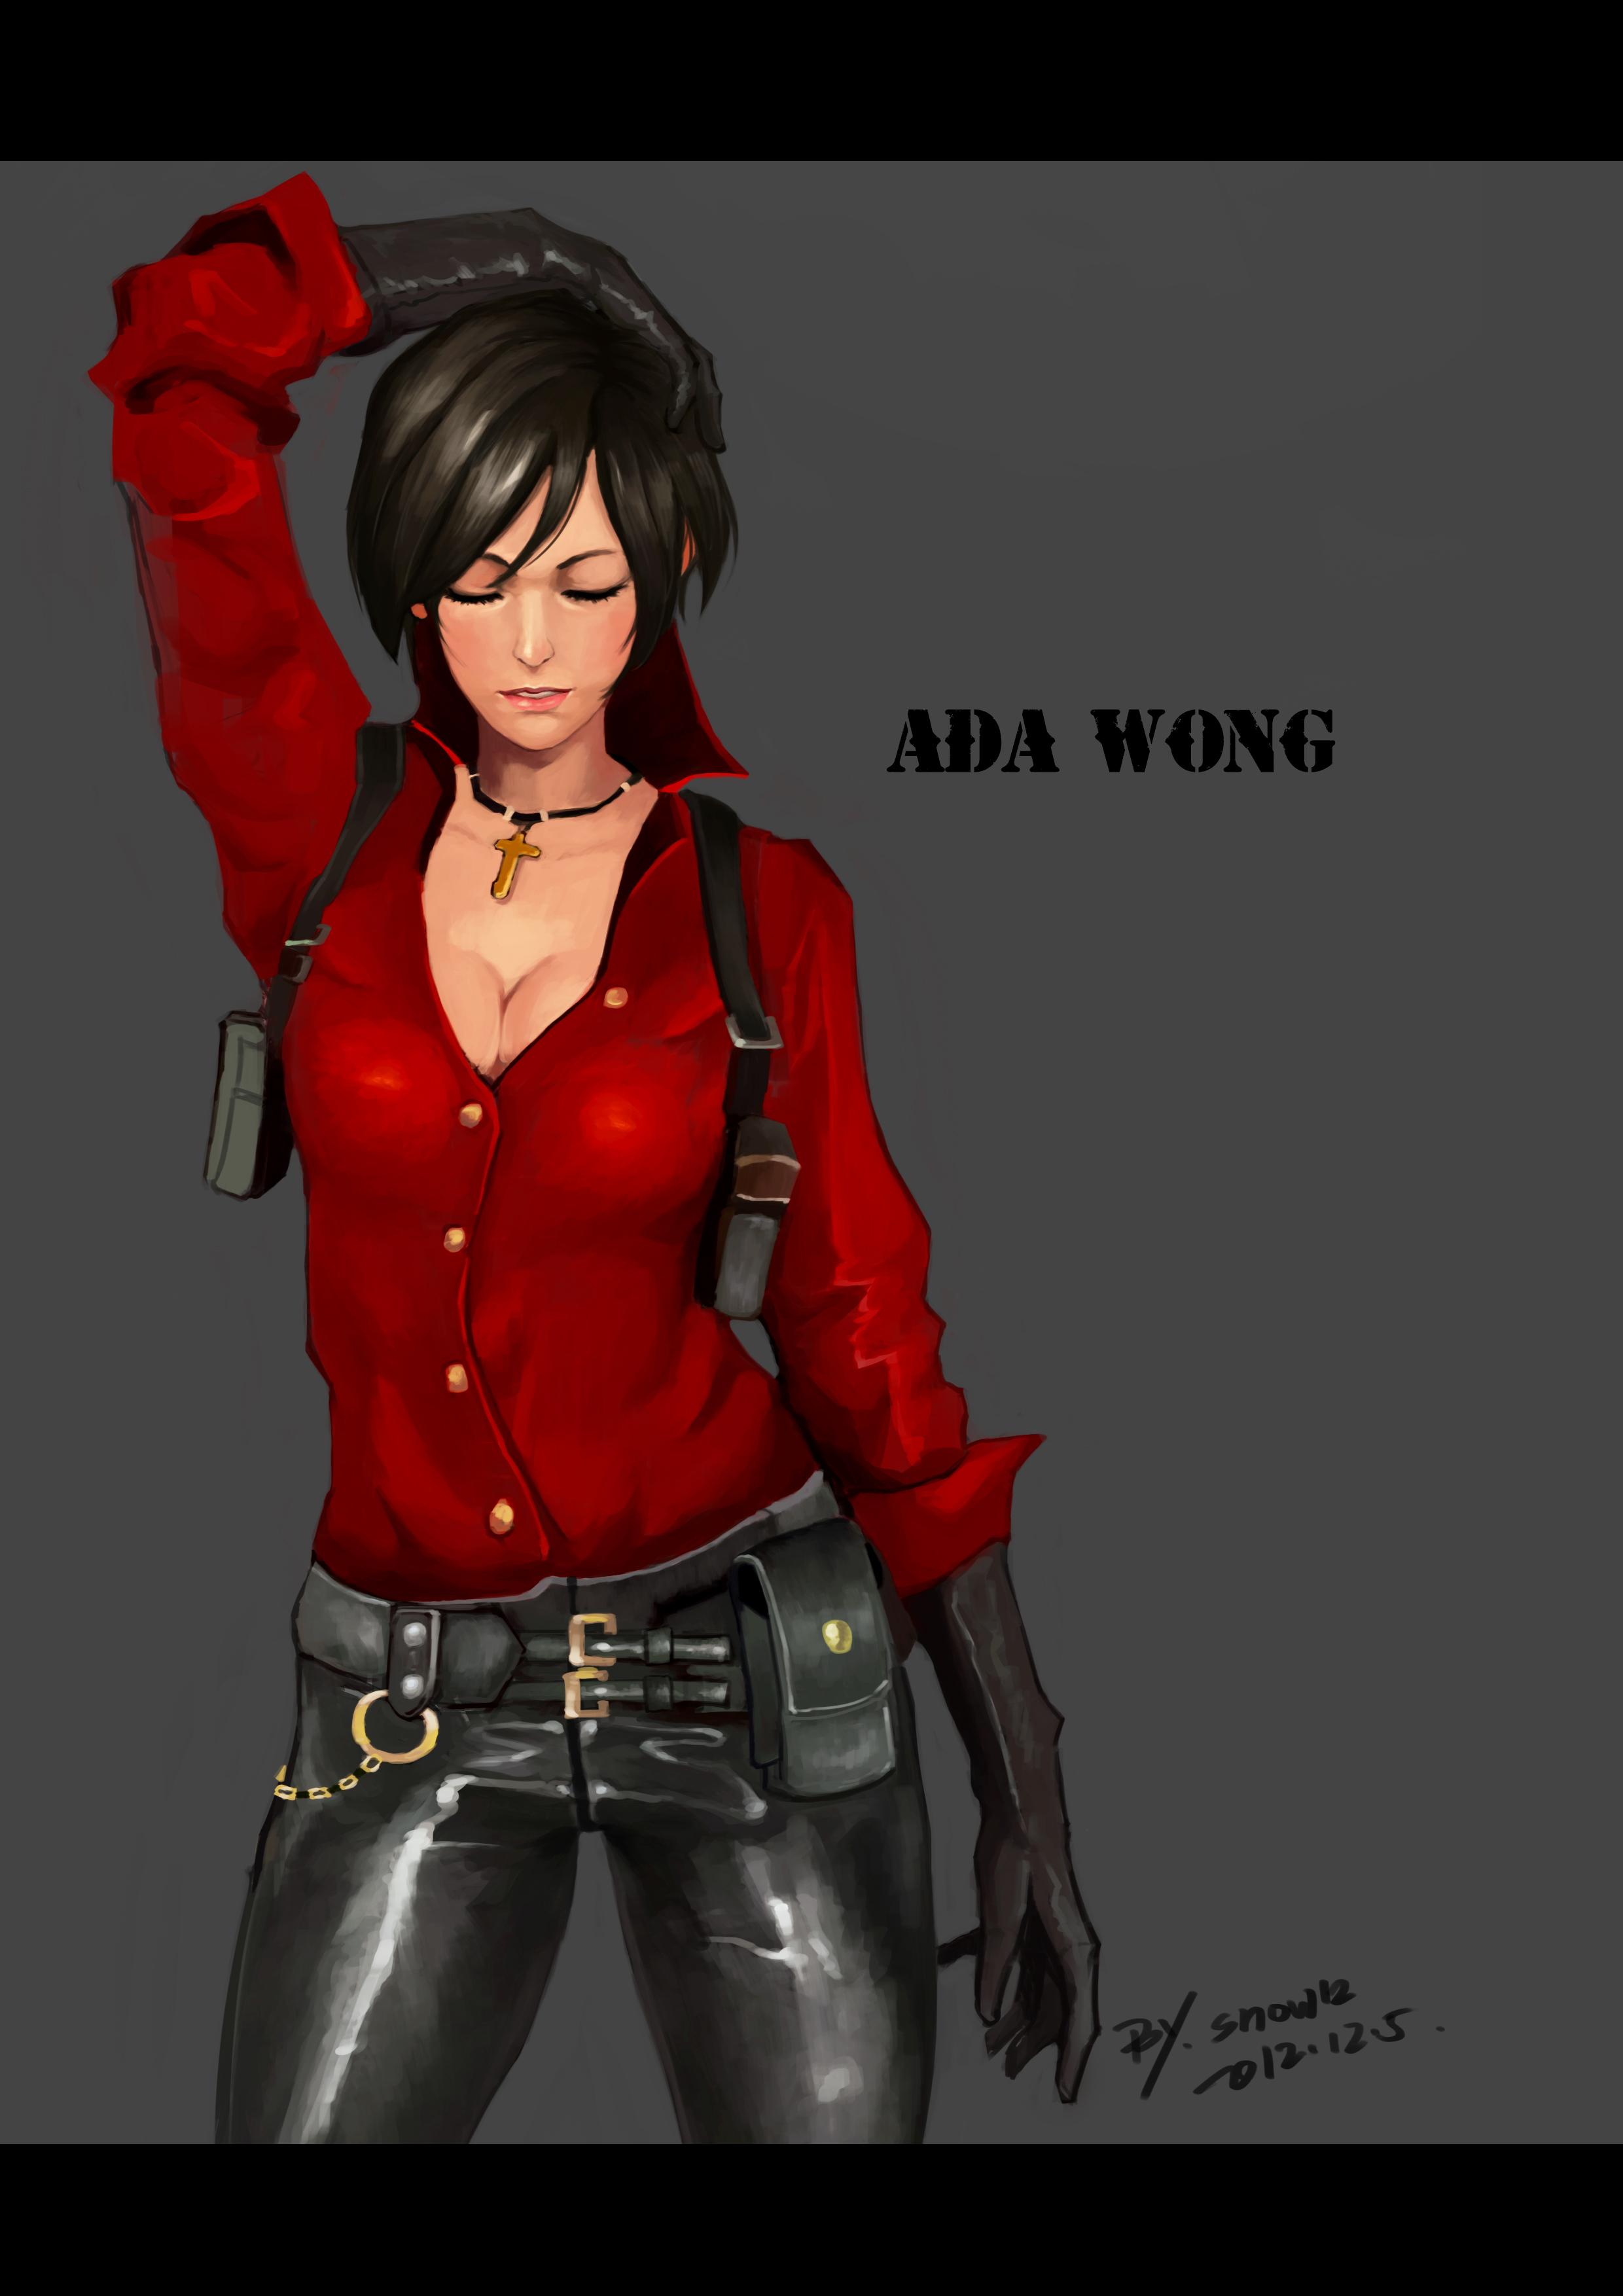 image Ada wong resident evil mod